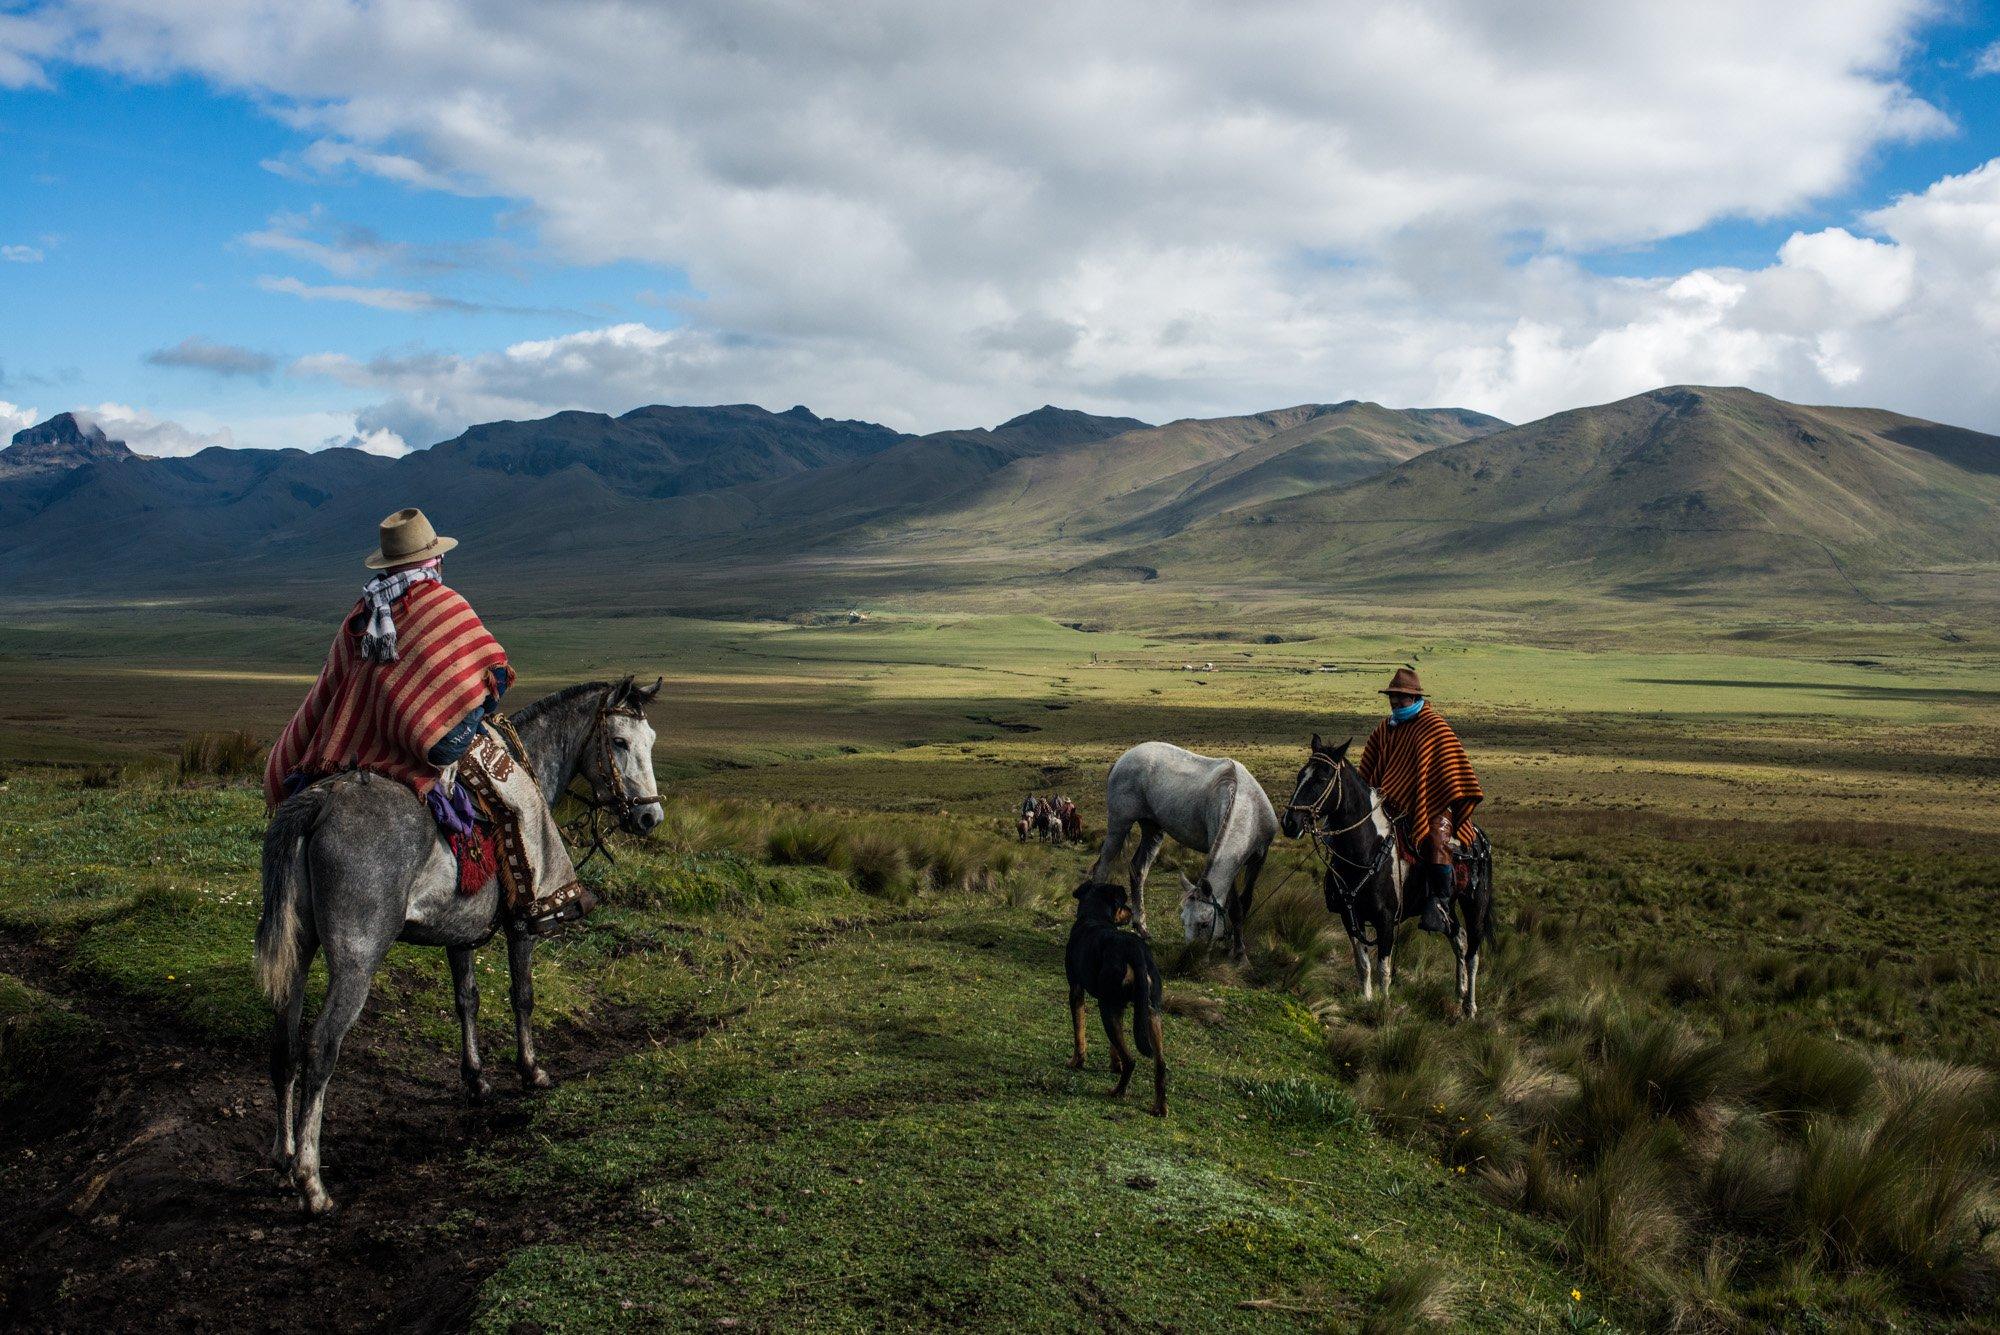 color photograph of cowboys riding horses